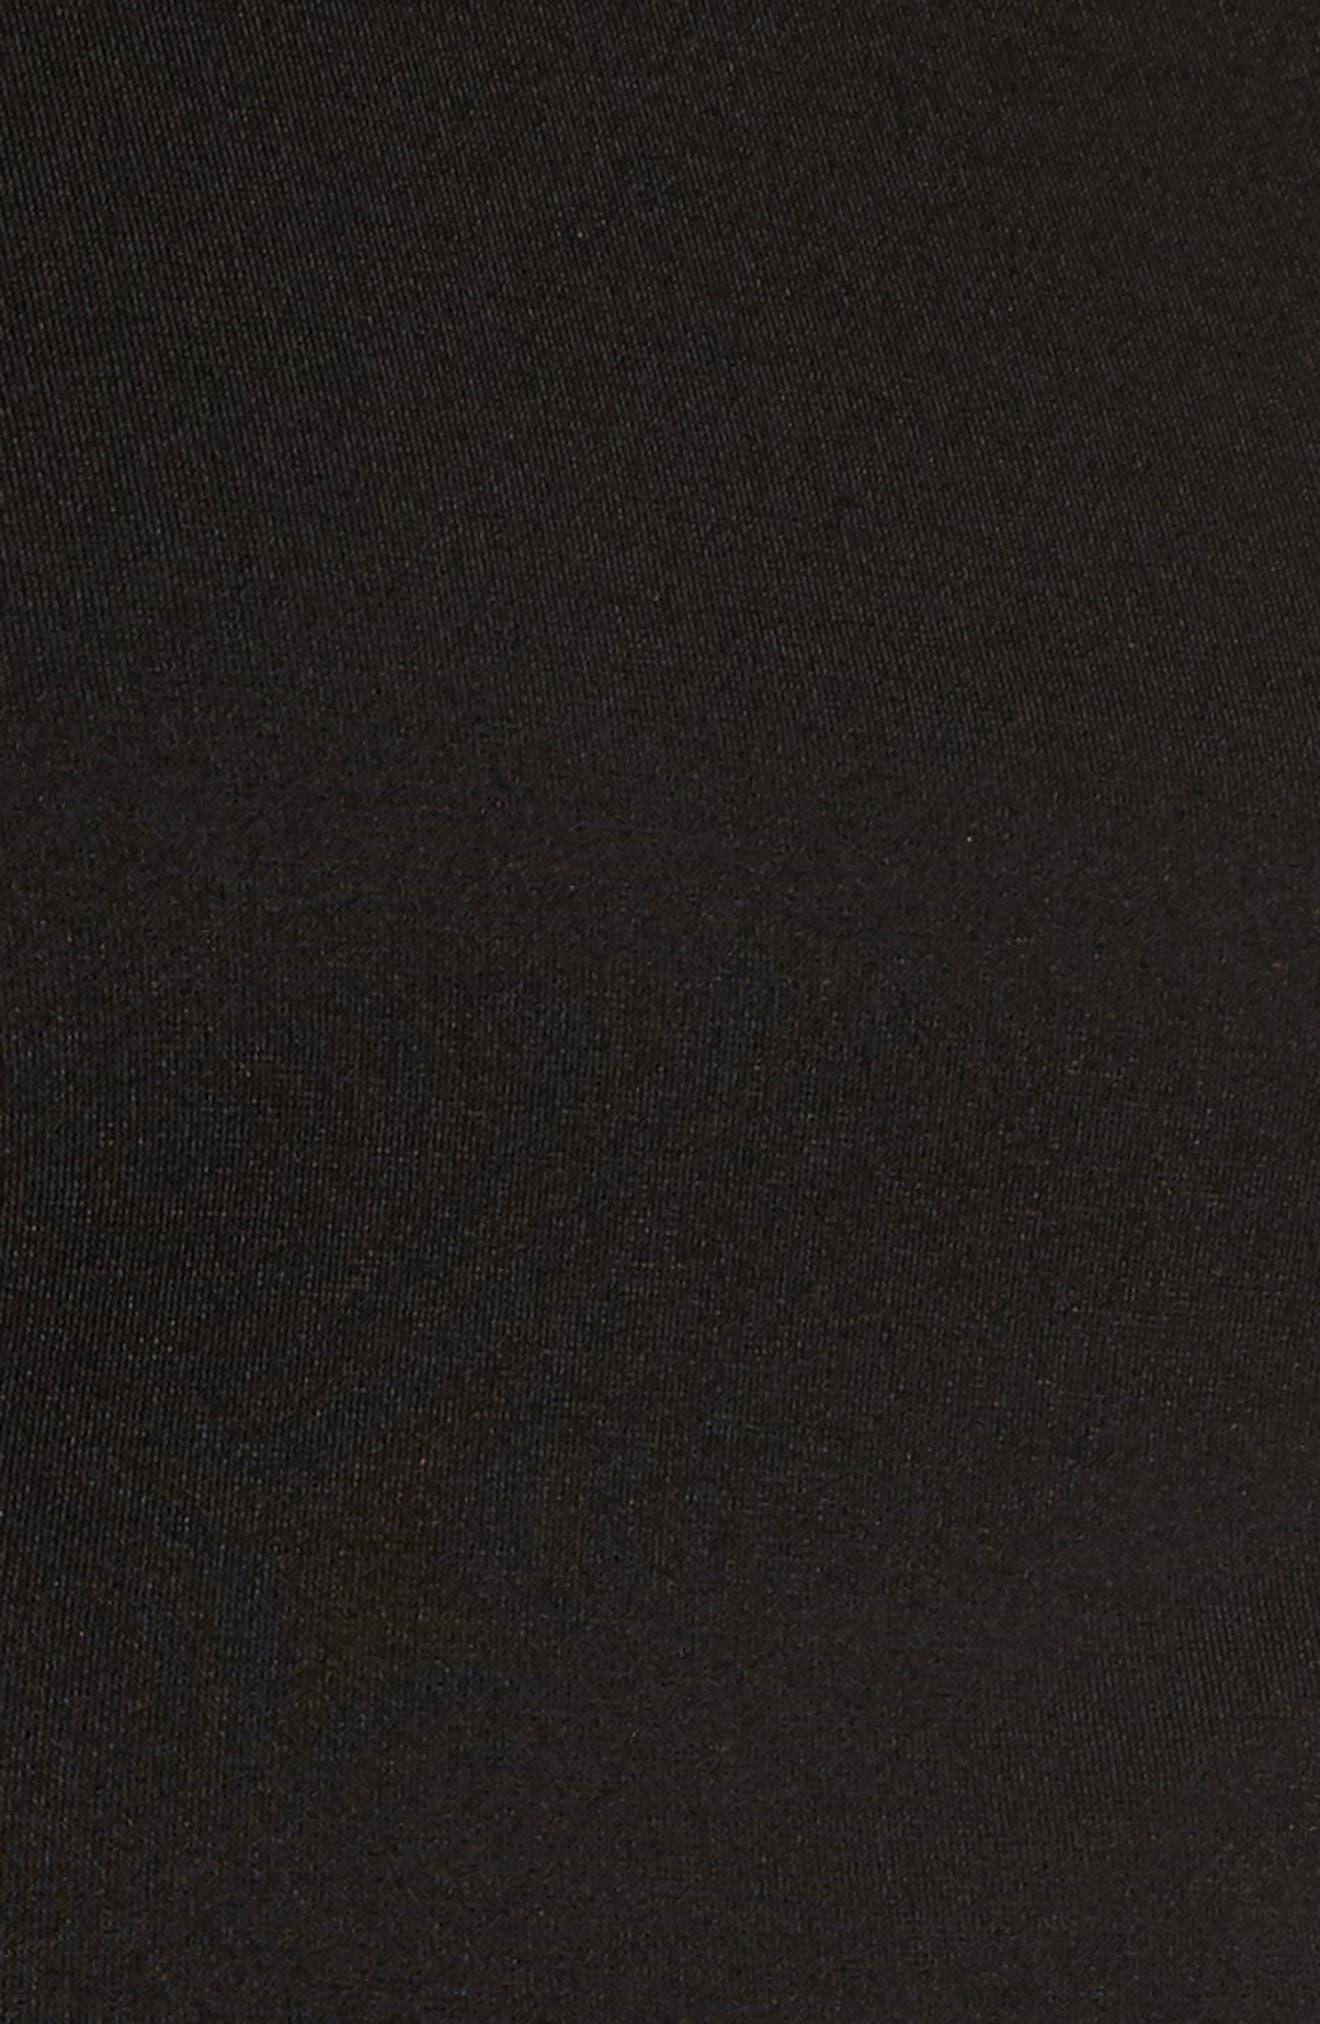 Big Bow Peplum Top,                             Alternate thumbnail 6, color,                             Black